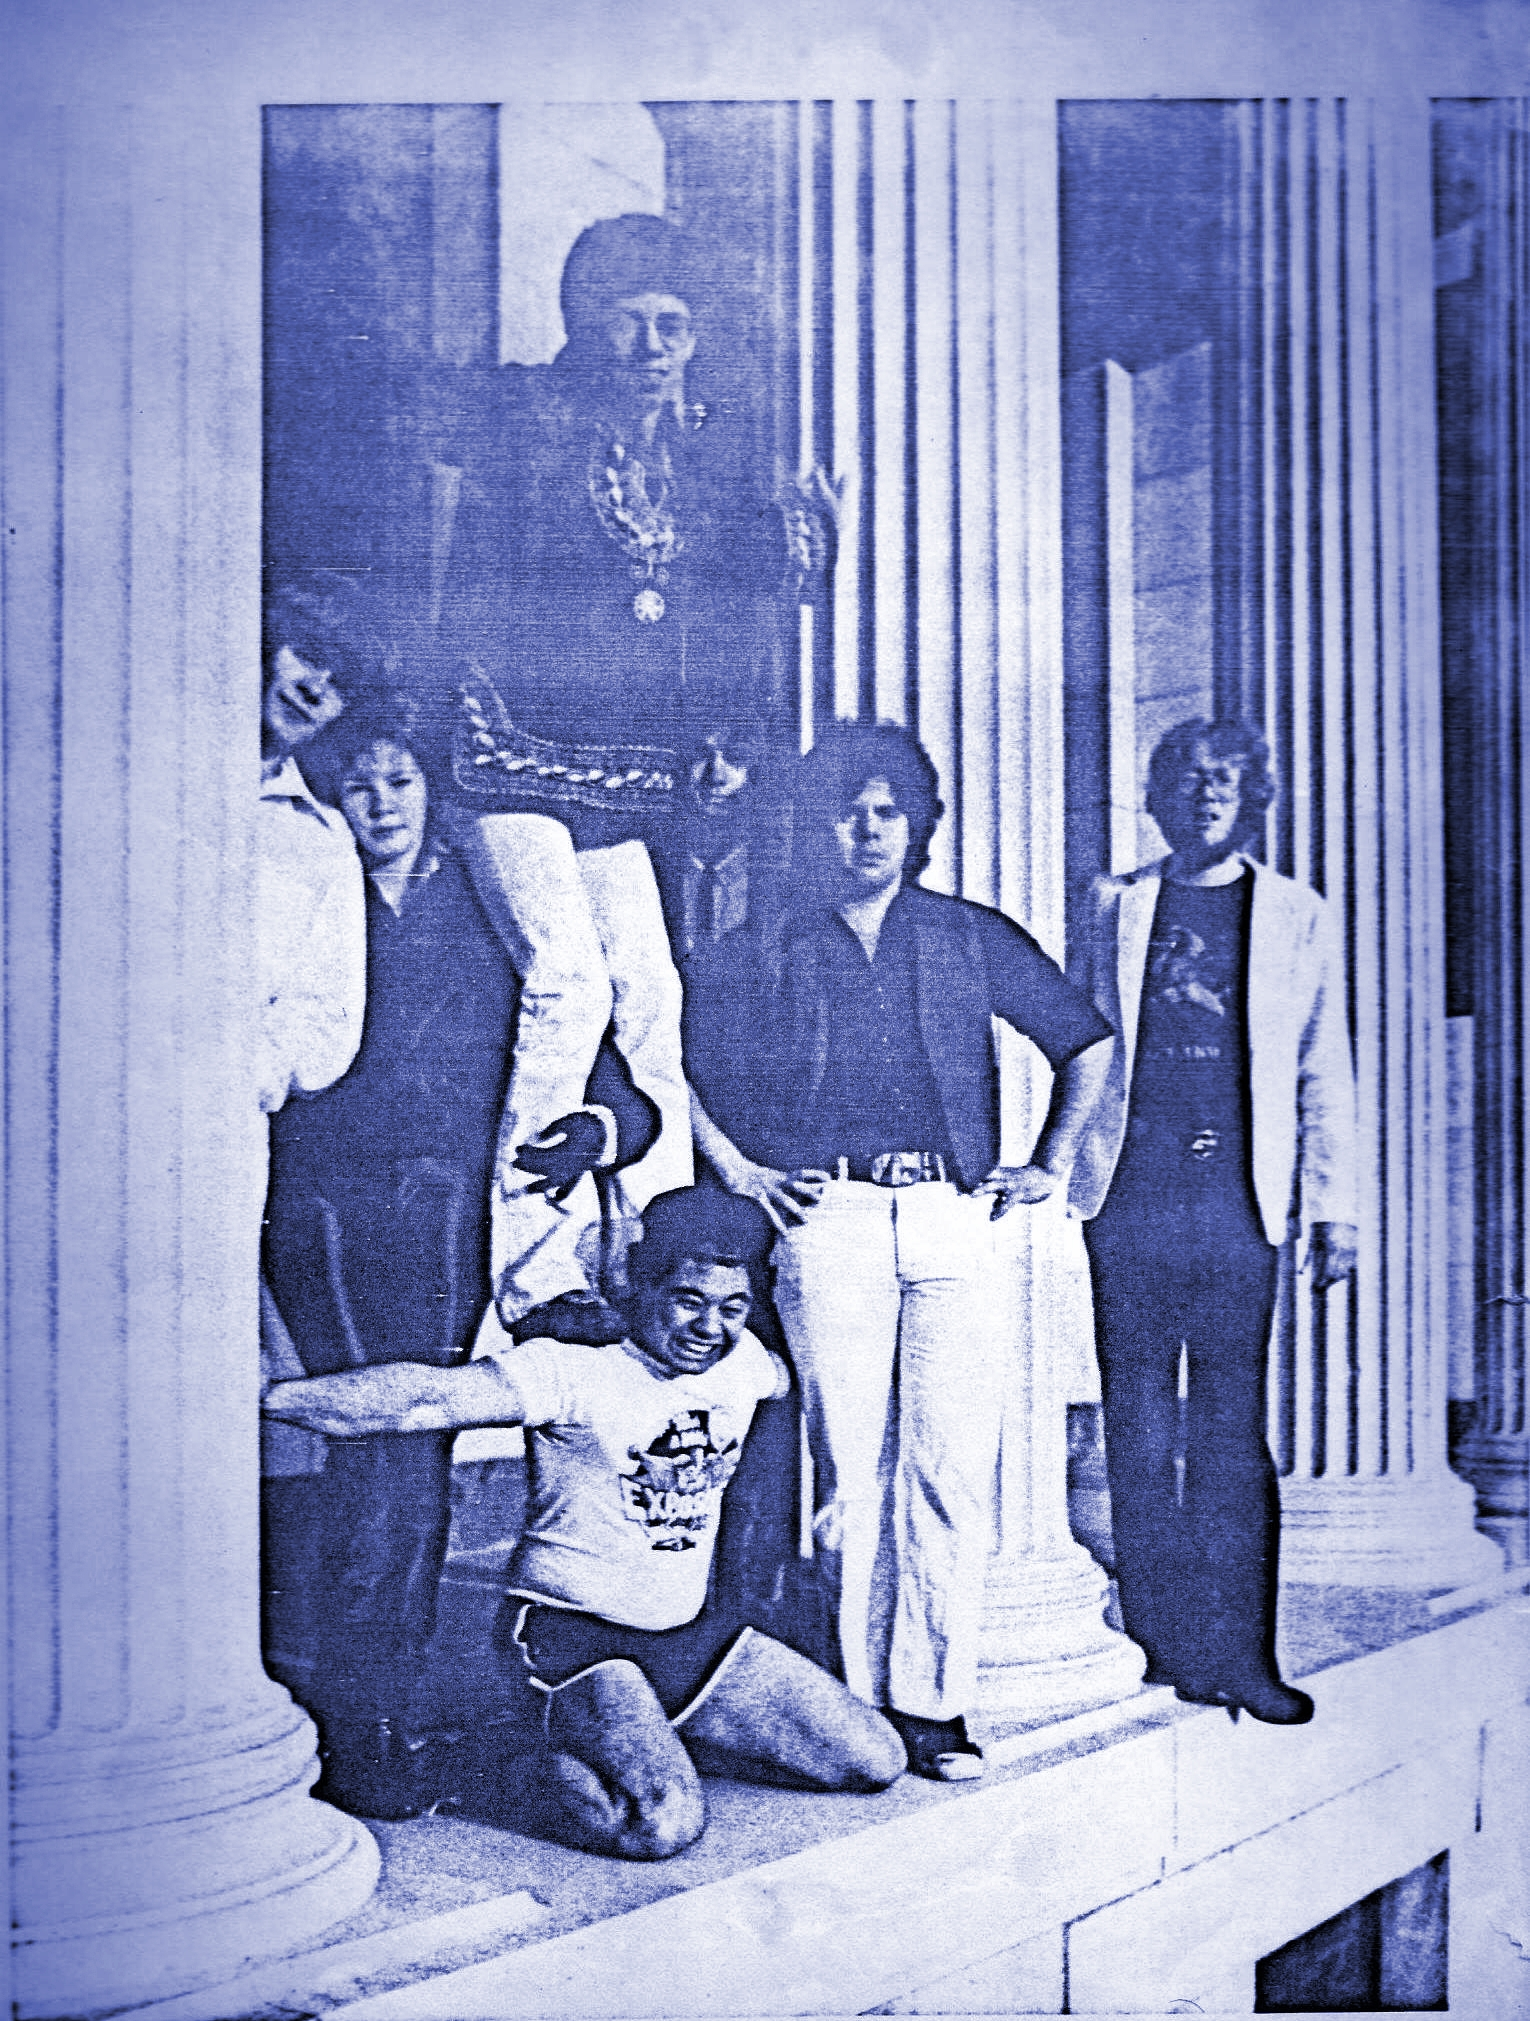 Parousia brings down the house at Melanie's Pub August 1980: Front- Barry, Gerry, Eric. Back- Patt, Kim, Bob & Garth